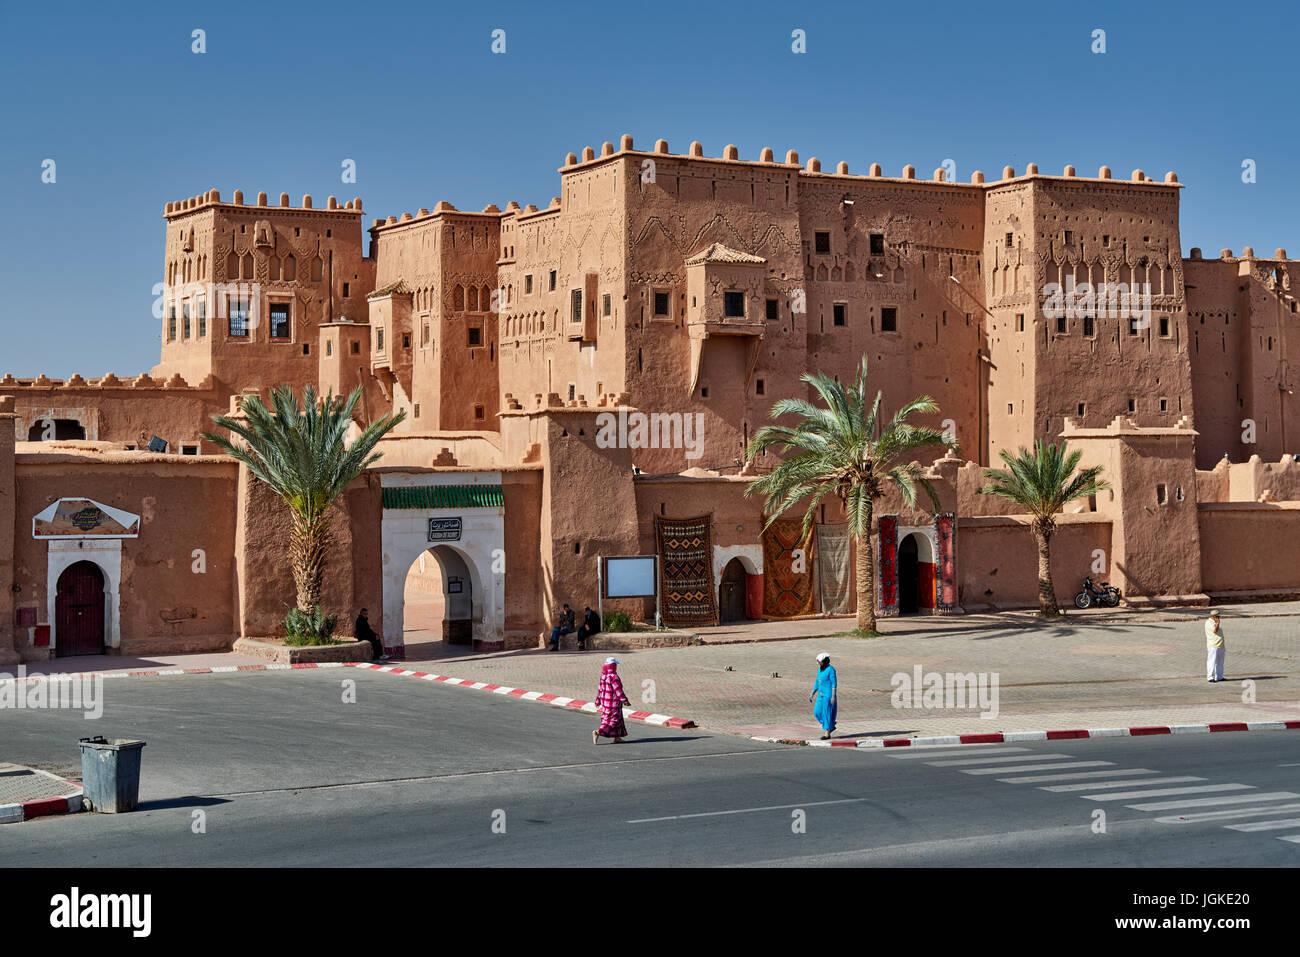 Fuera de tiro de Kasbah Taourirt, Ouarzazate, Marruecos, África Imagen De Stock